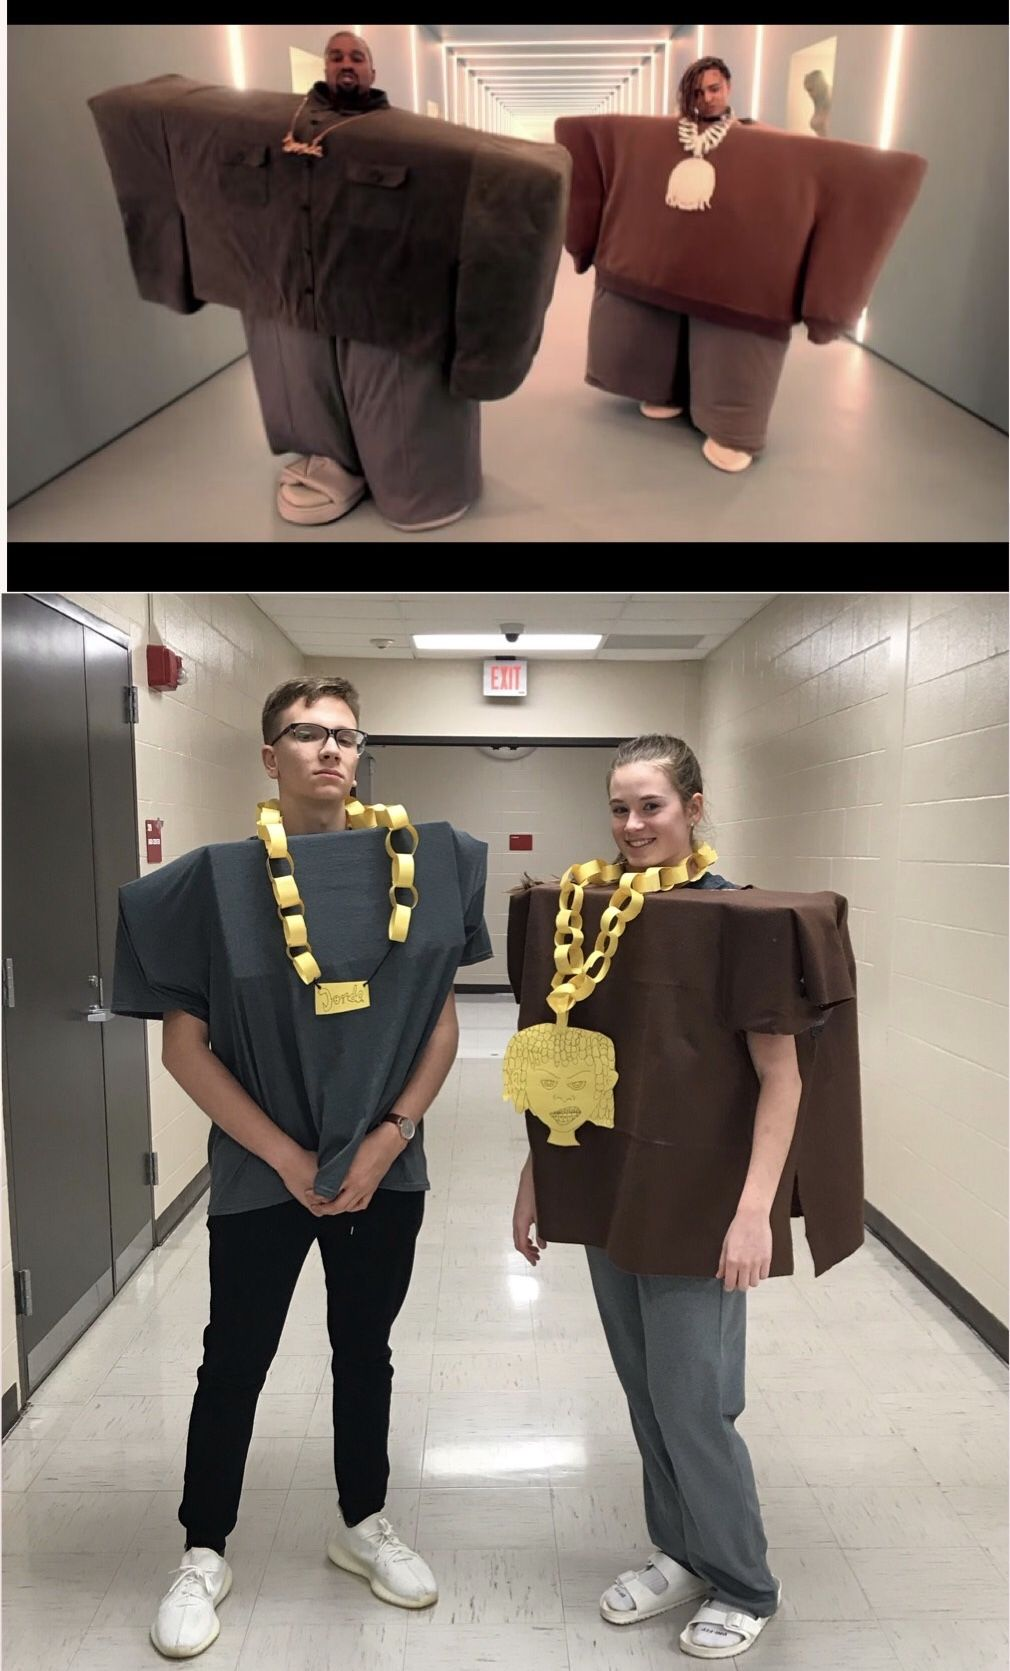 Meme Day Spirit Week Outfits Meme Costume Meme Day Costumes